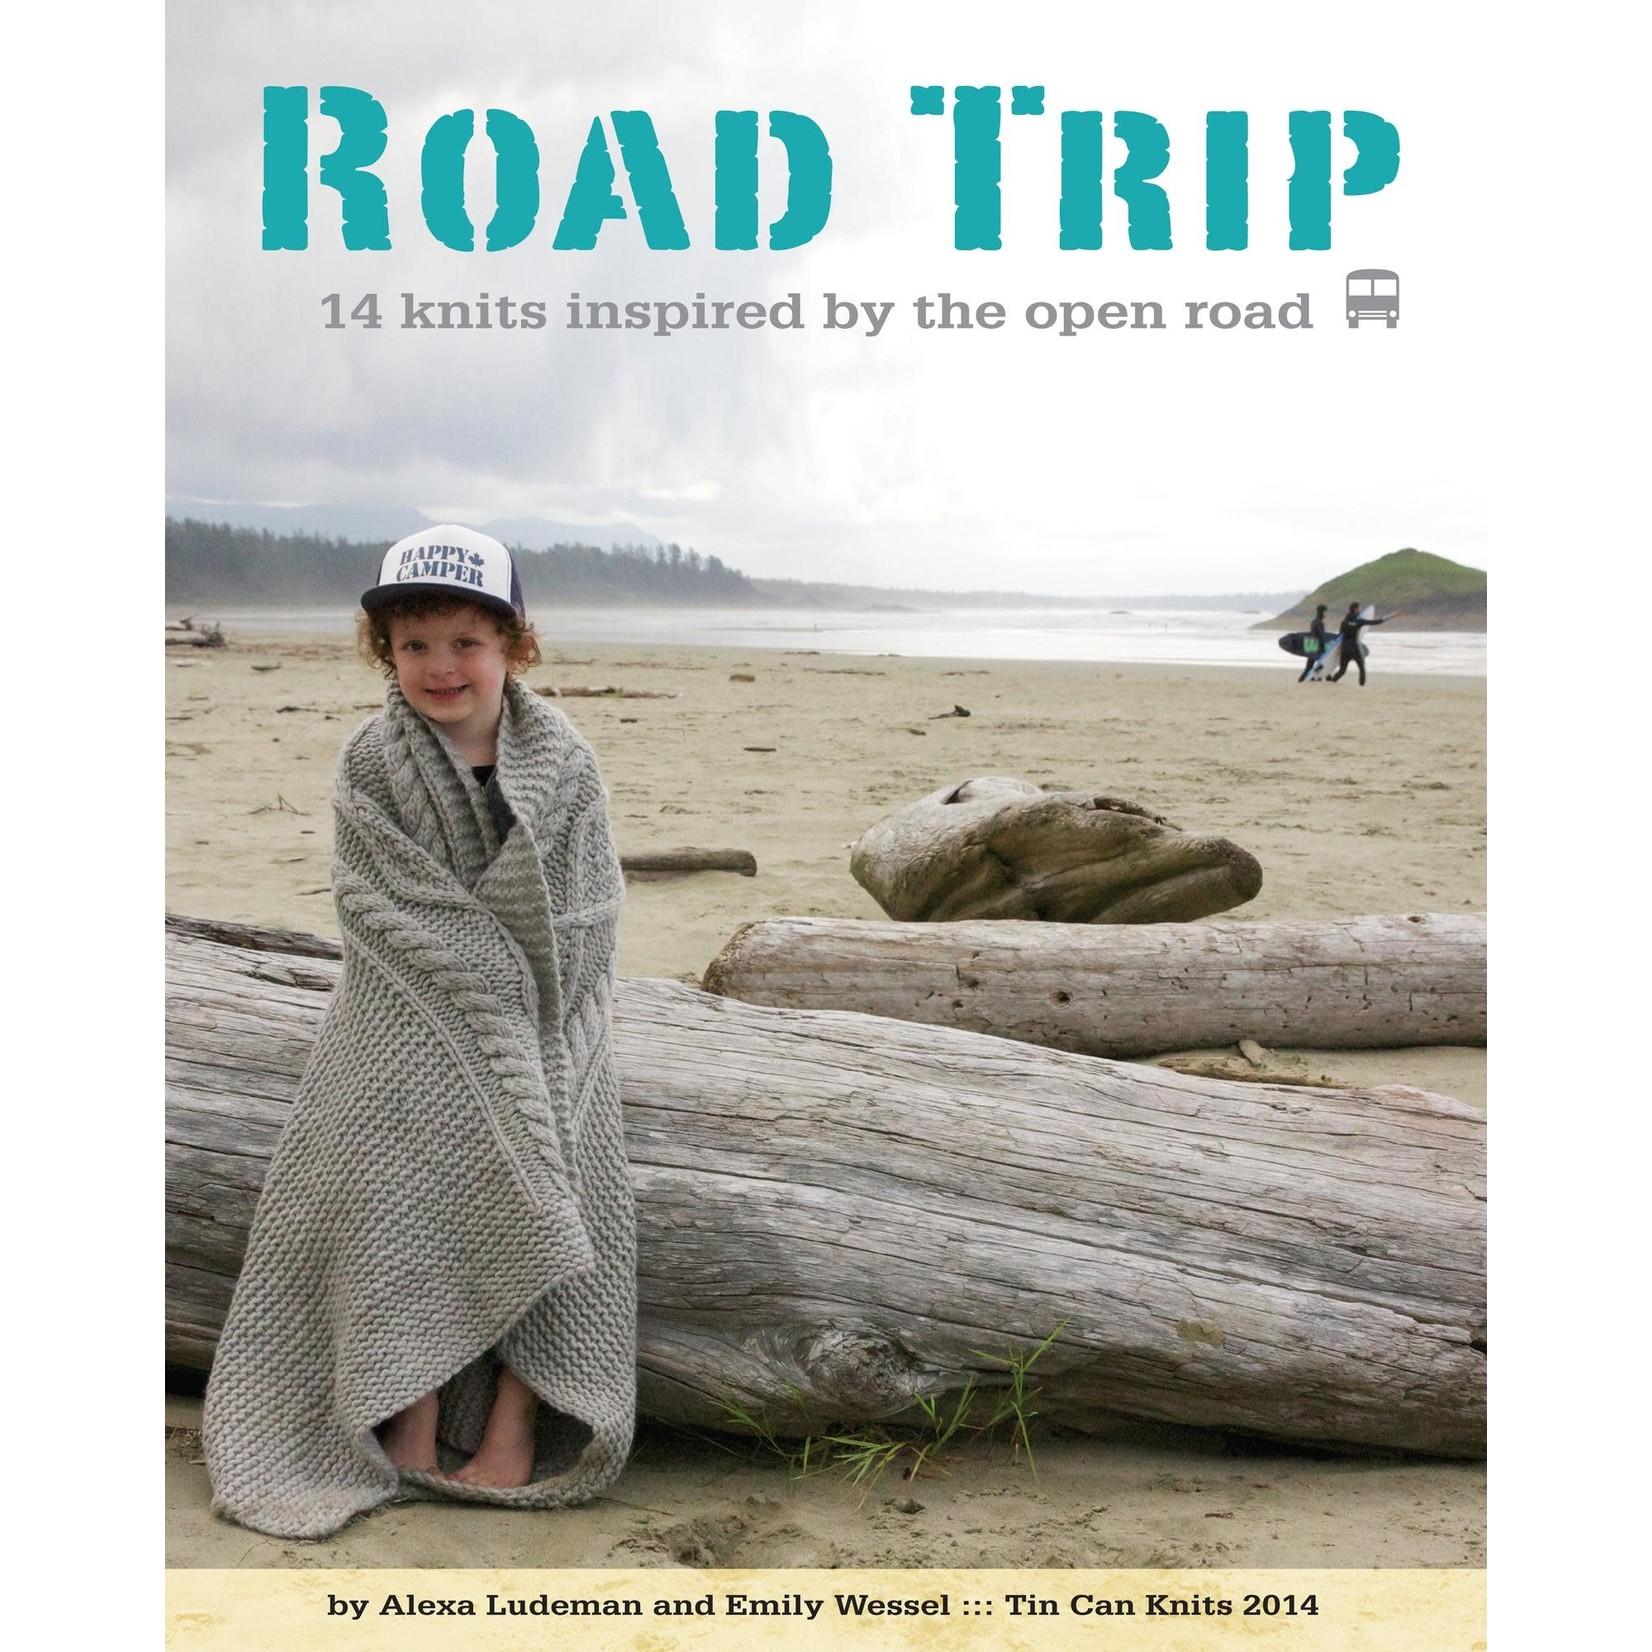 Tin Can Knits Road Trip